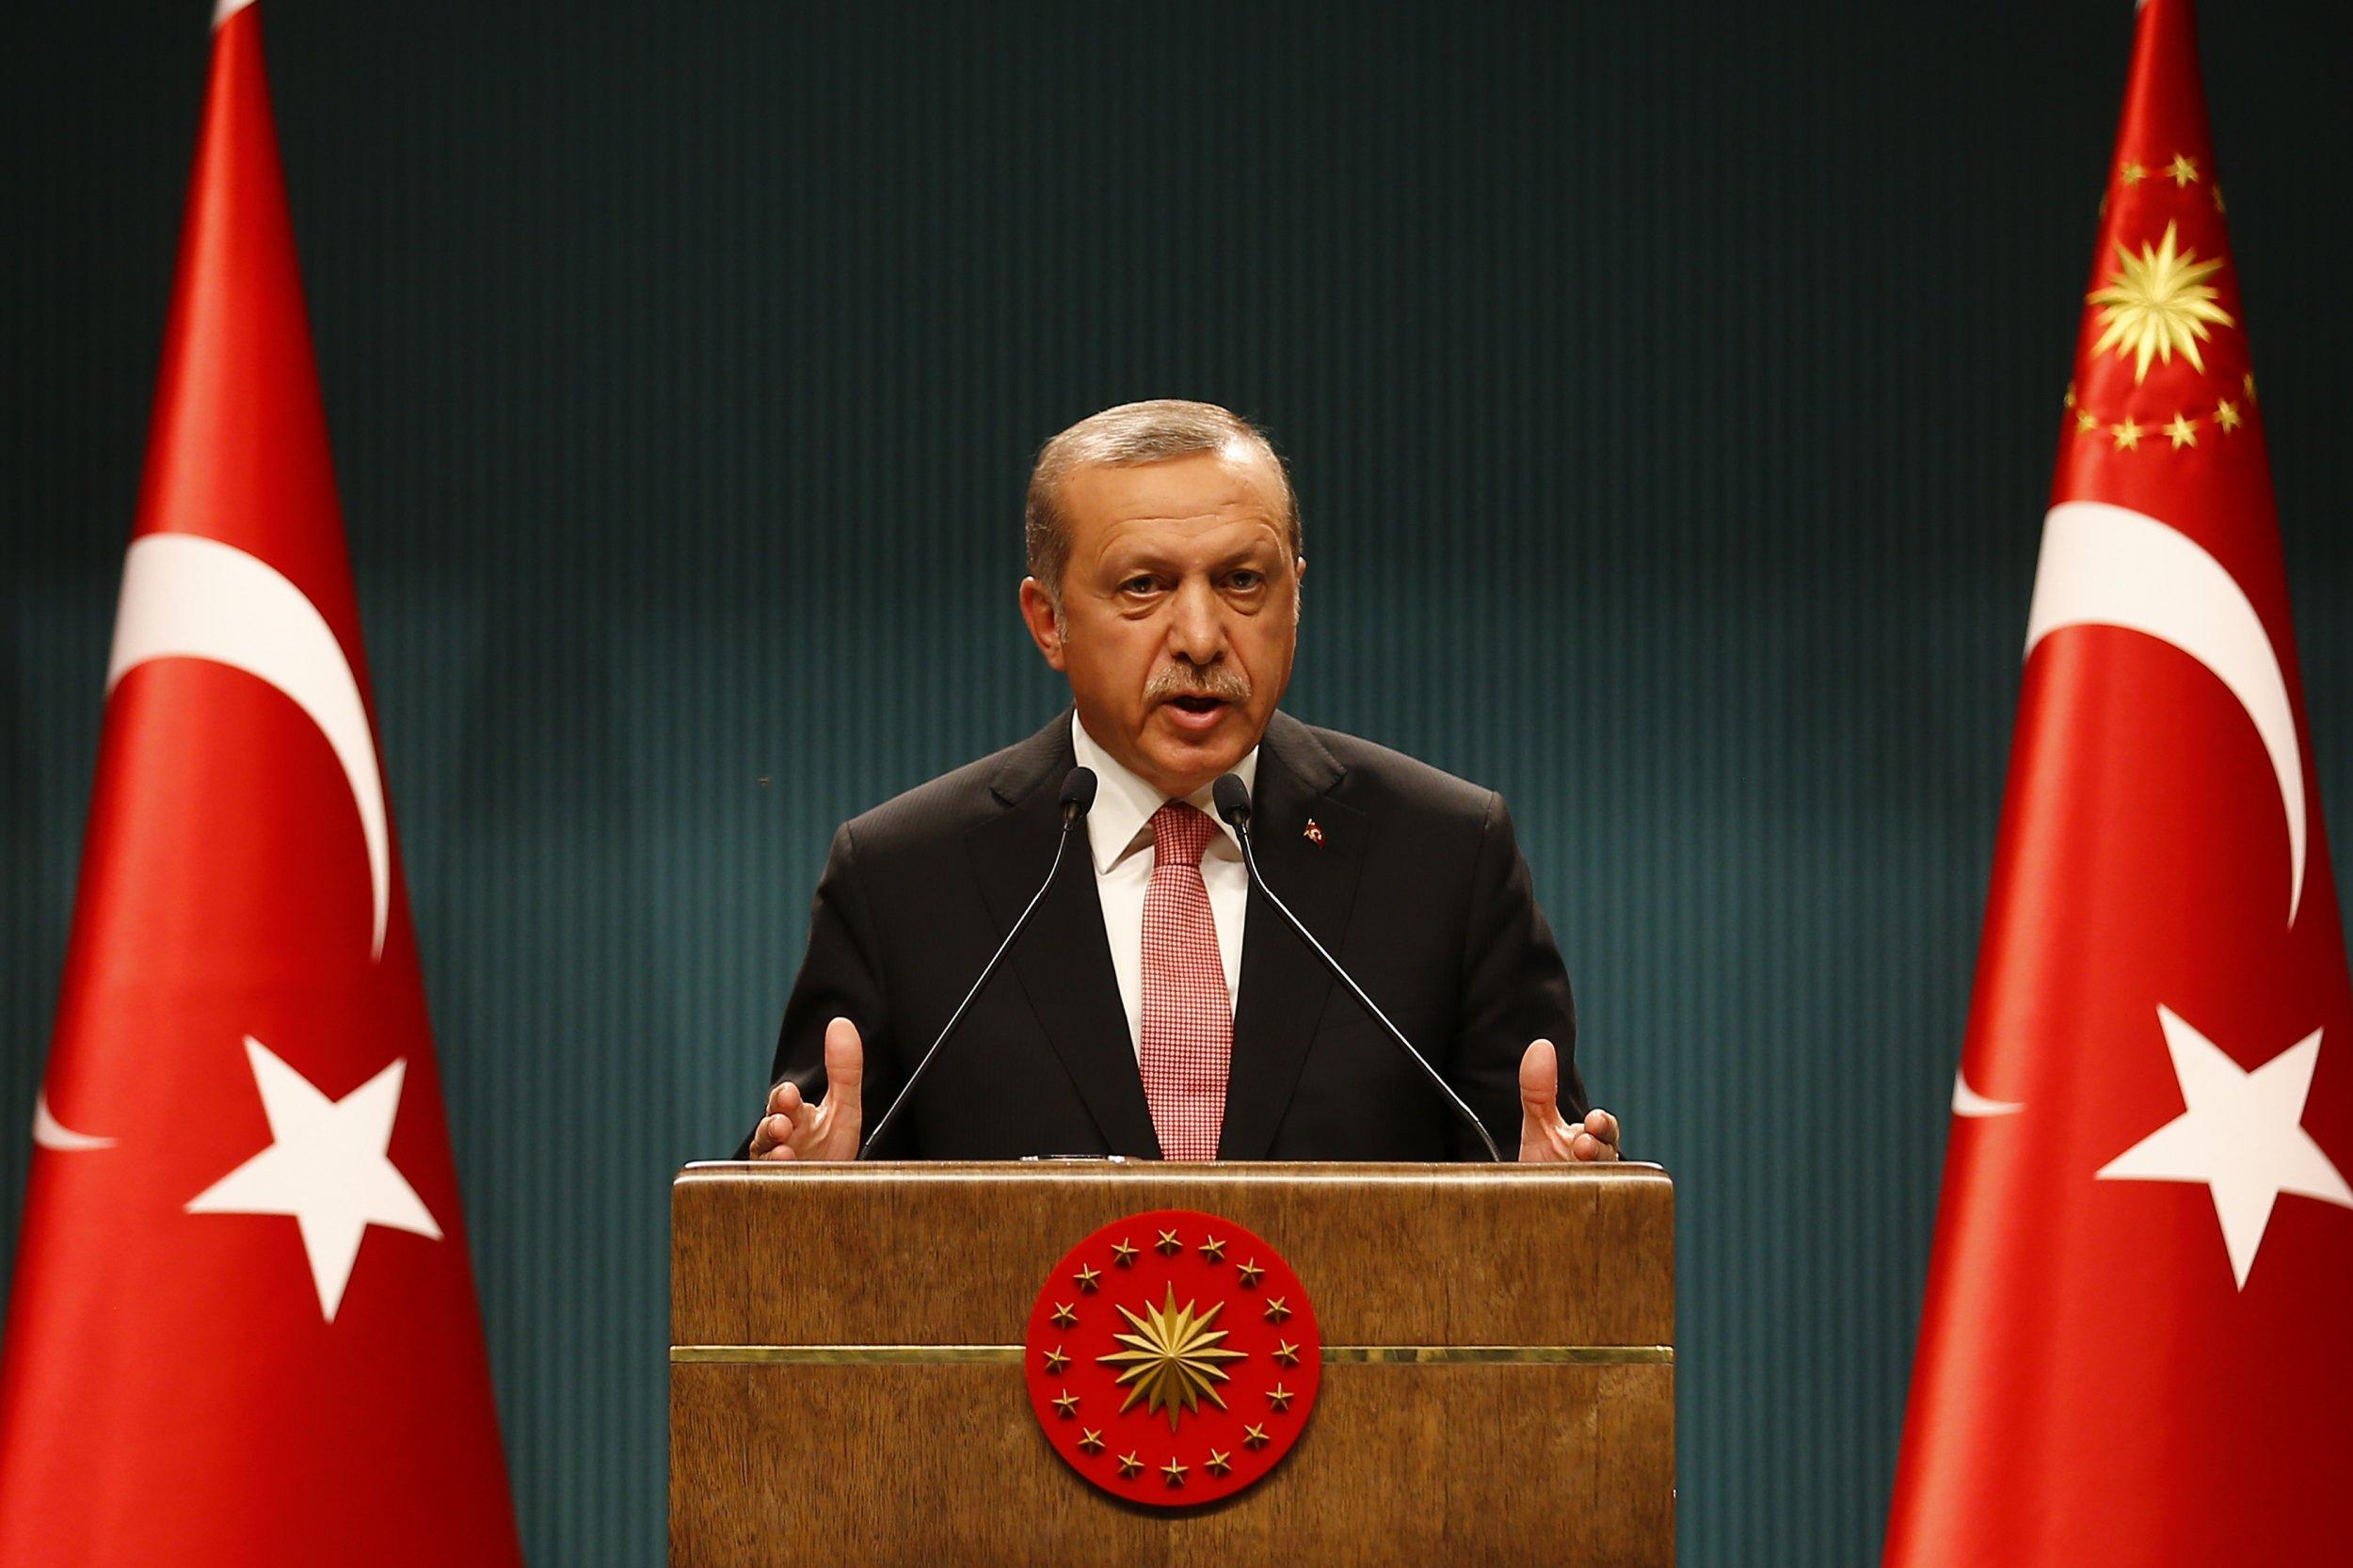 NATO Must Act to Halt Turkey's Freefall Into Putin's Arms